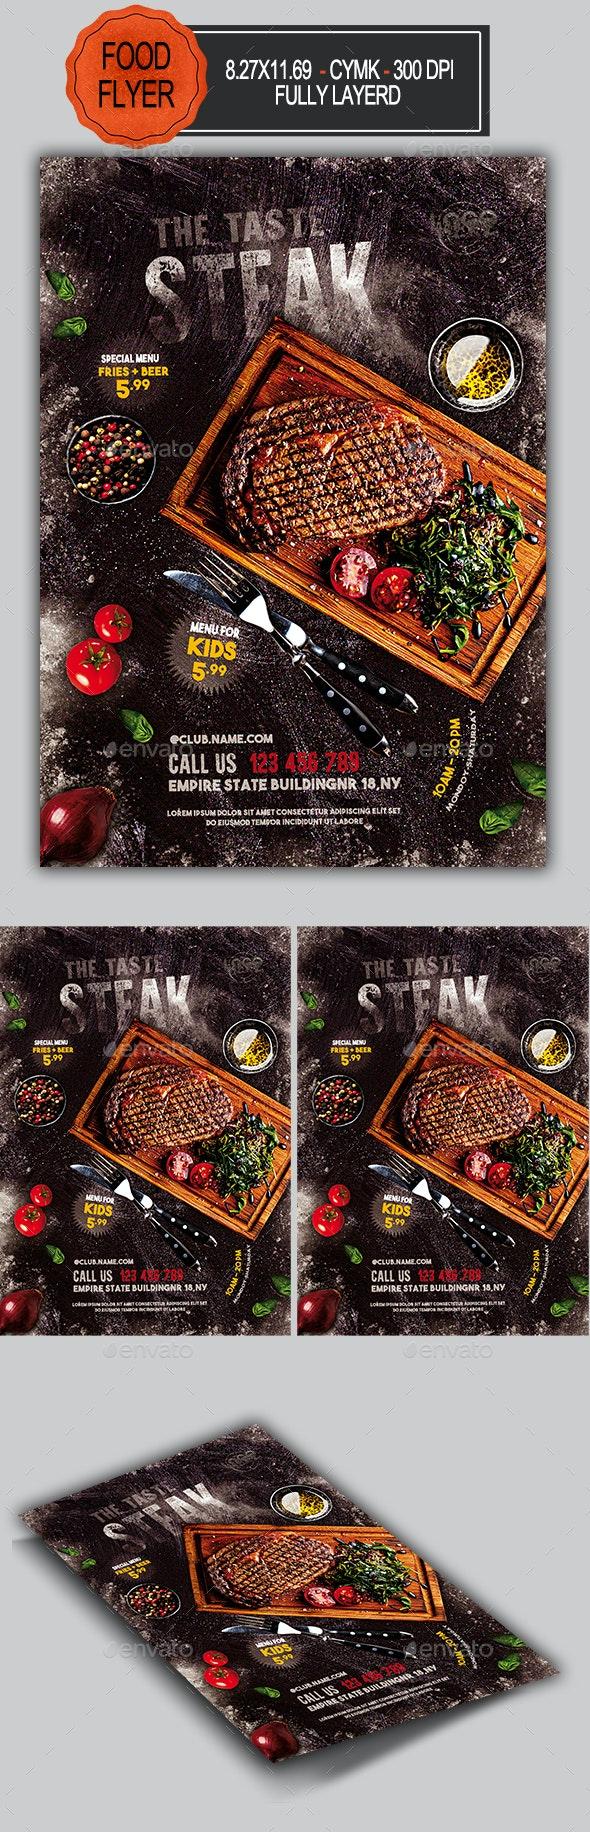 Steak House Flyer - Restaurant Flyers